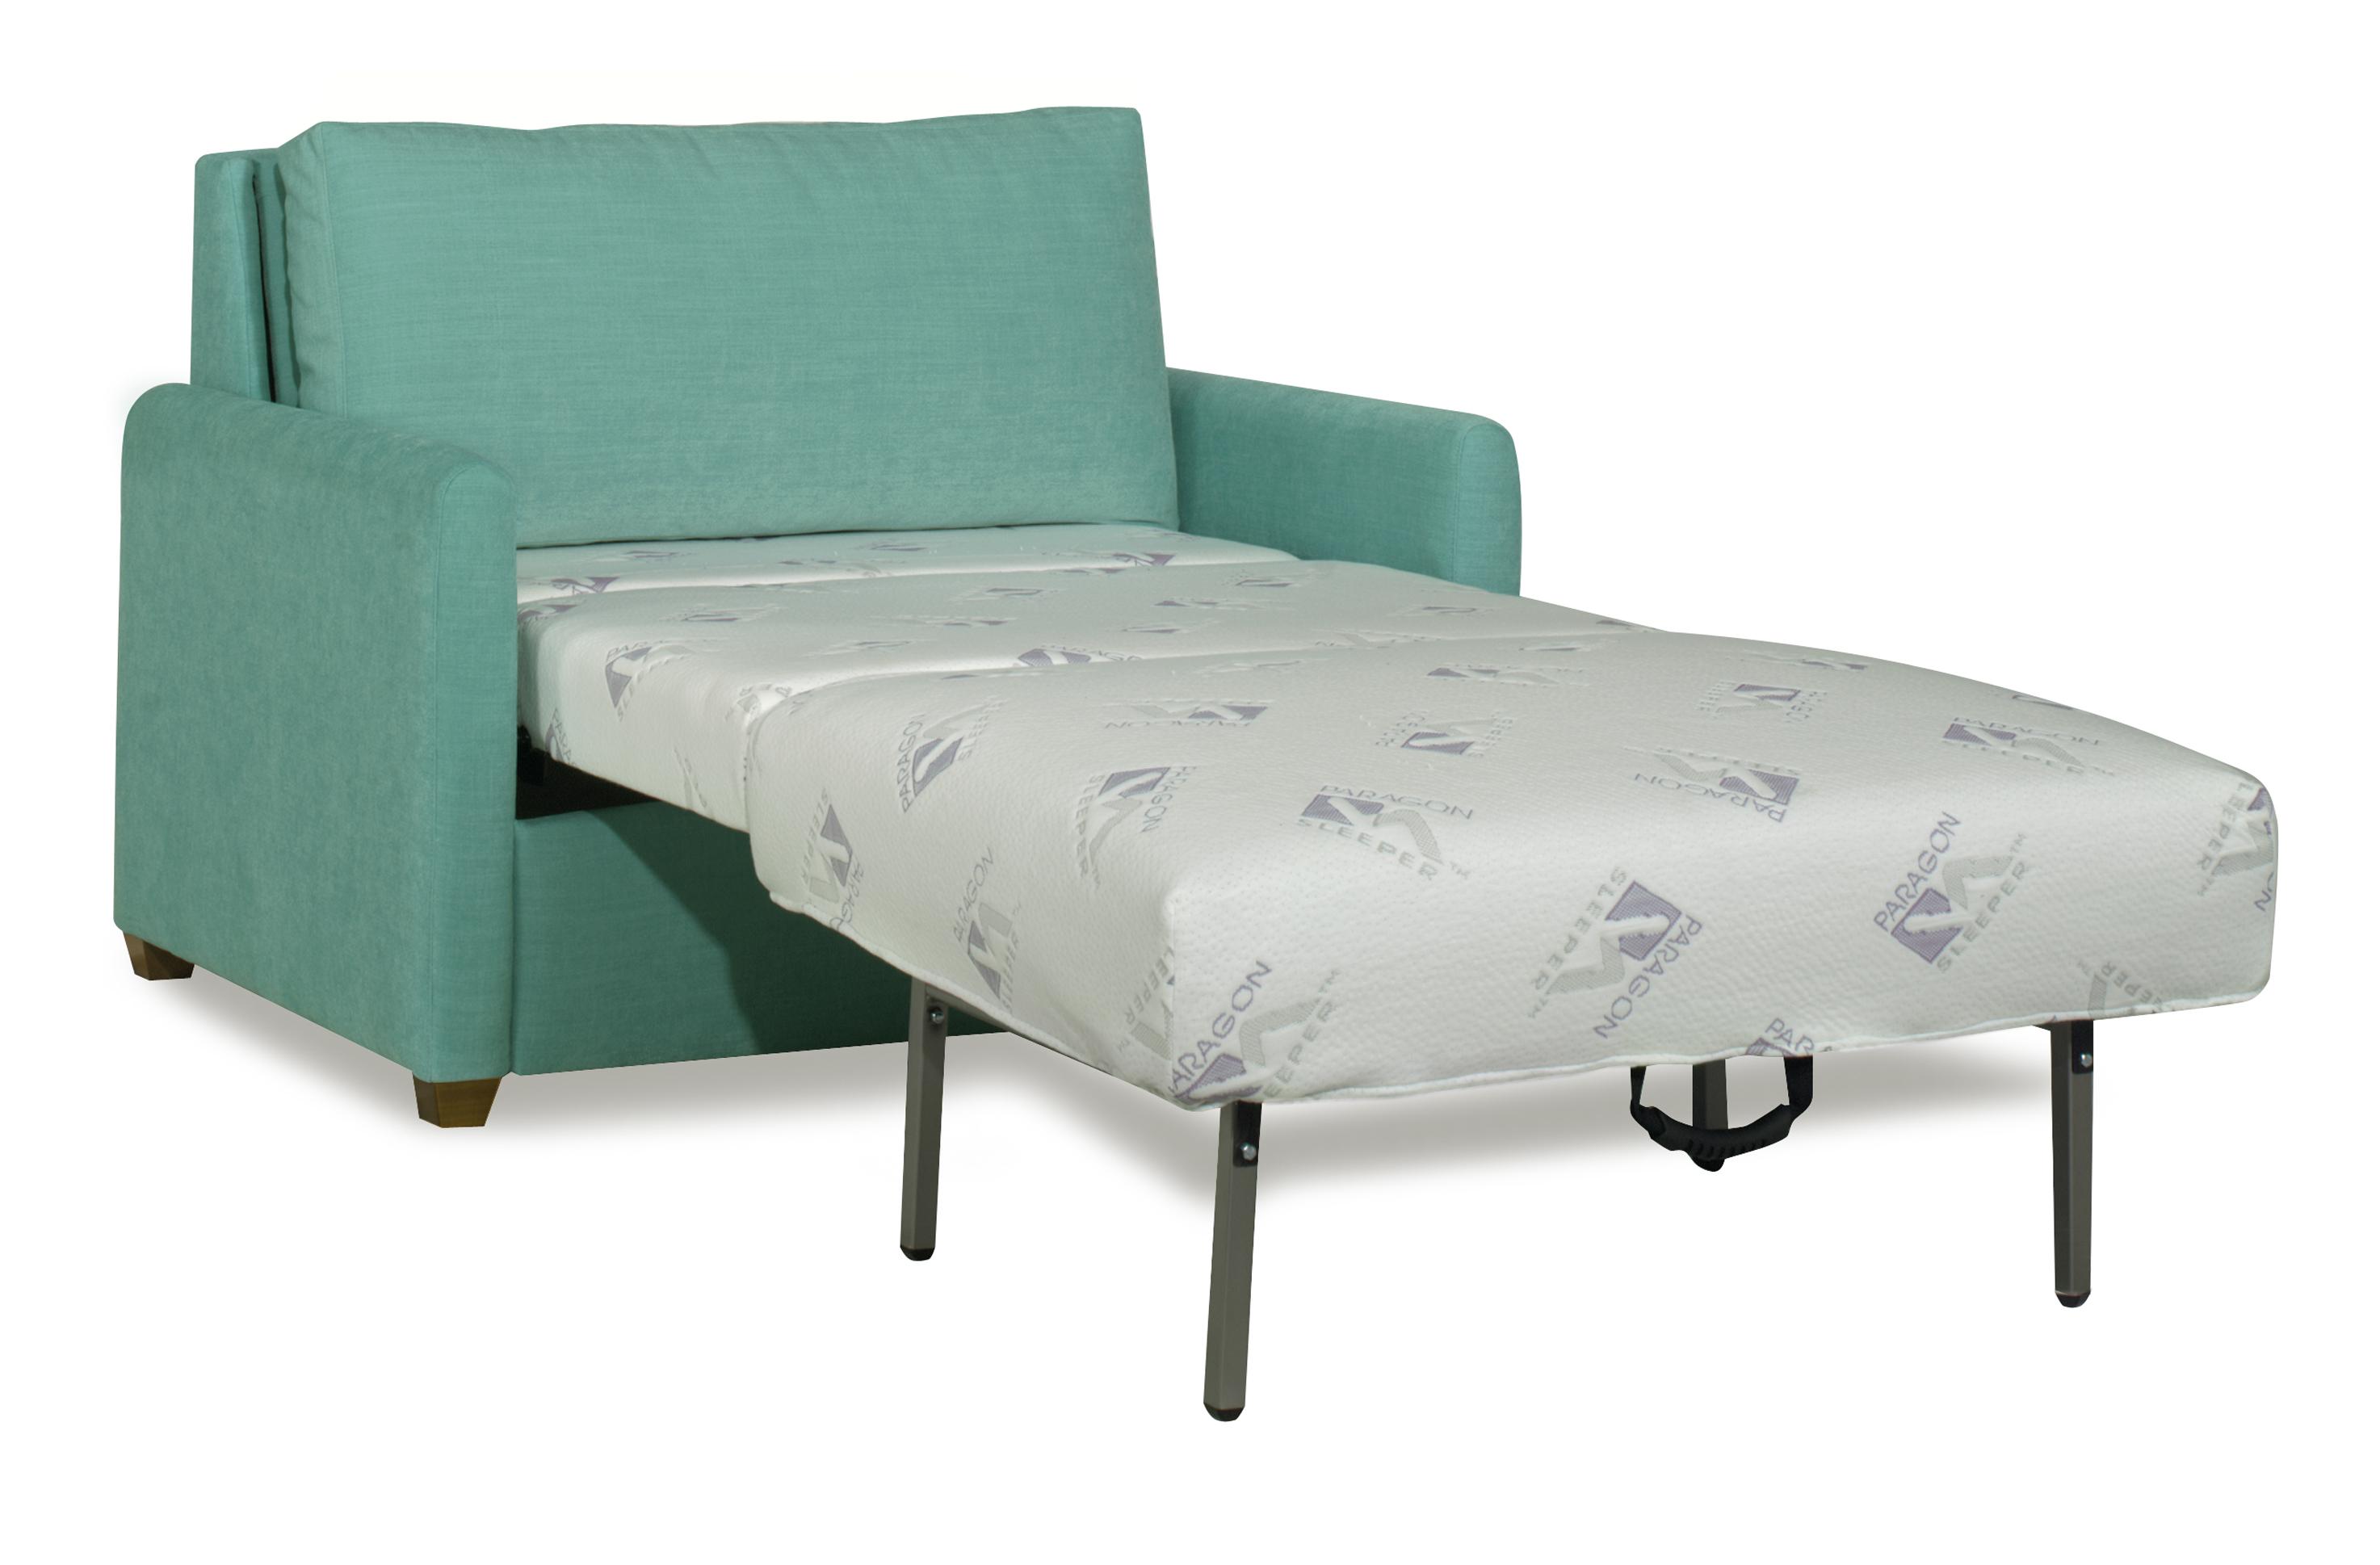 twin bed sleeper chair